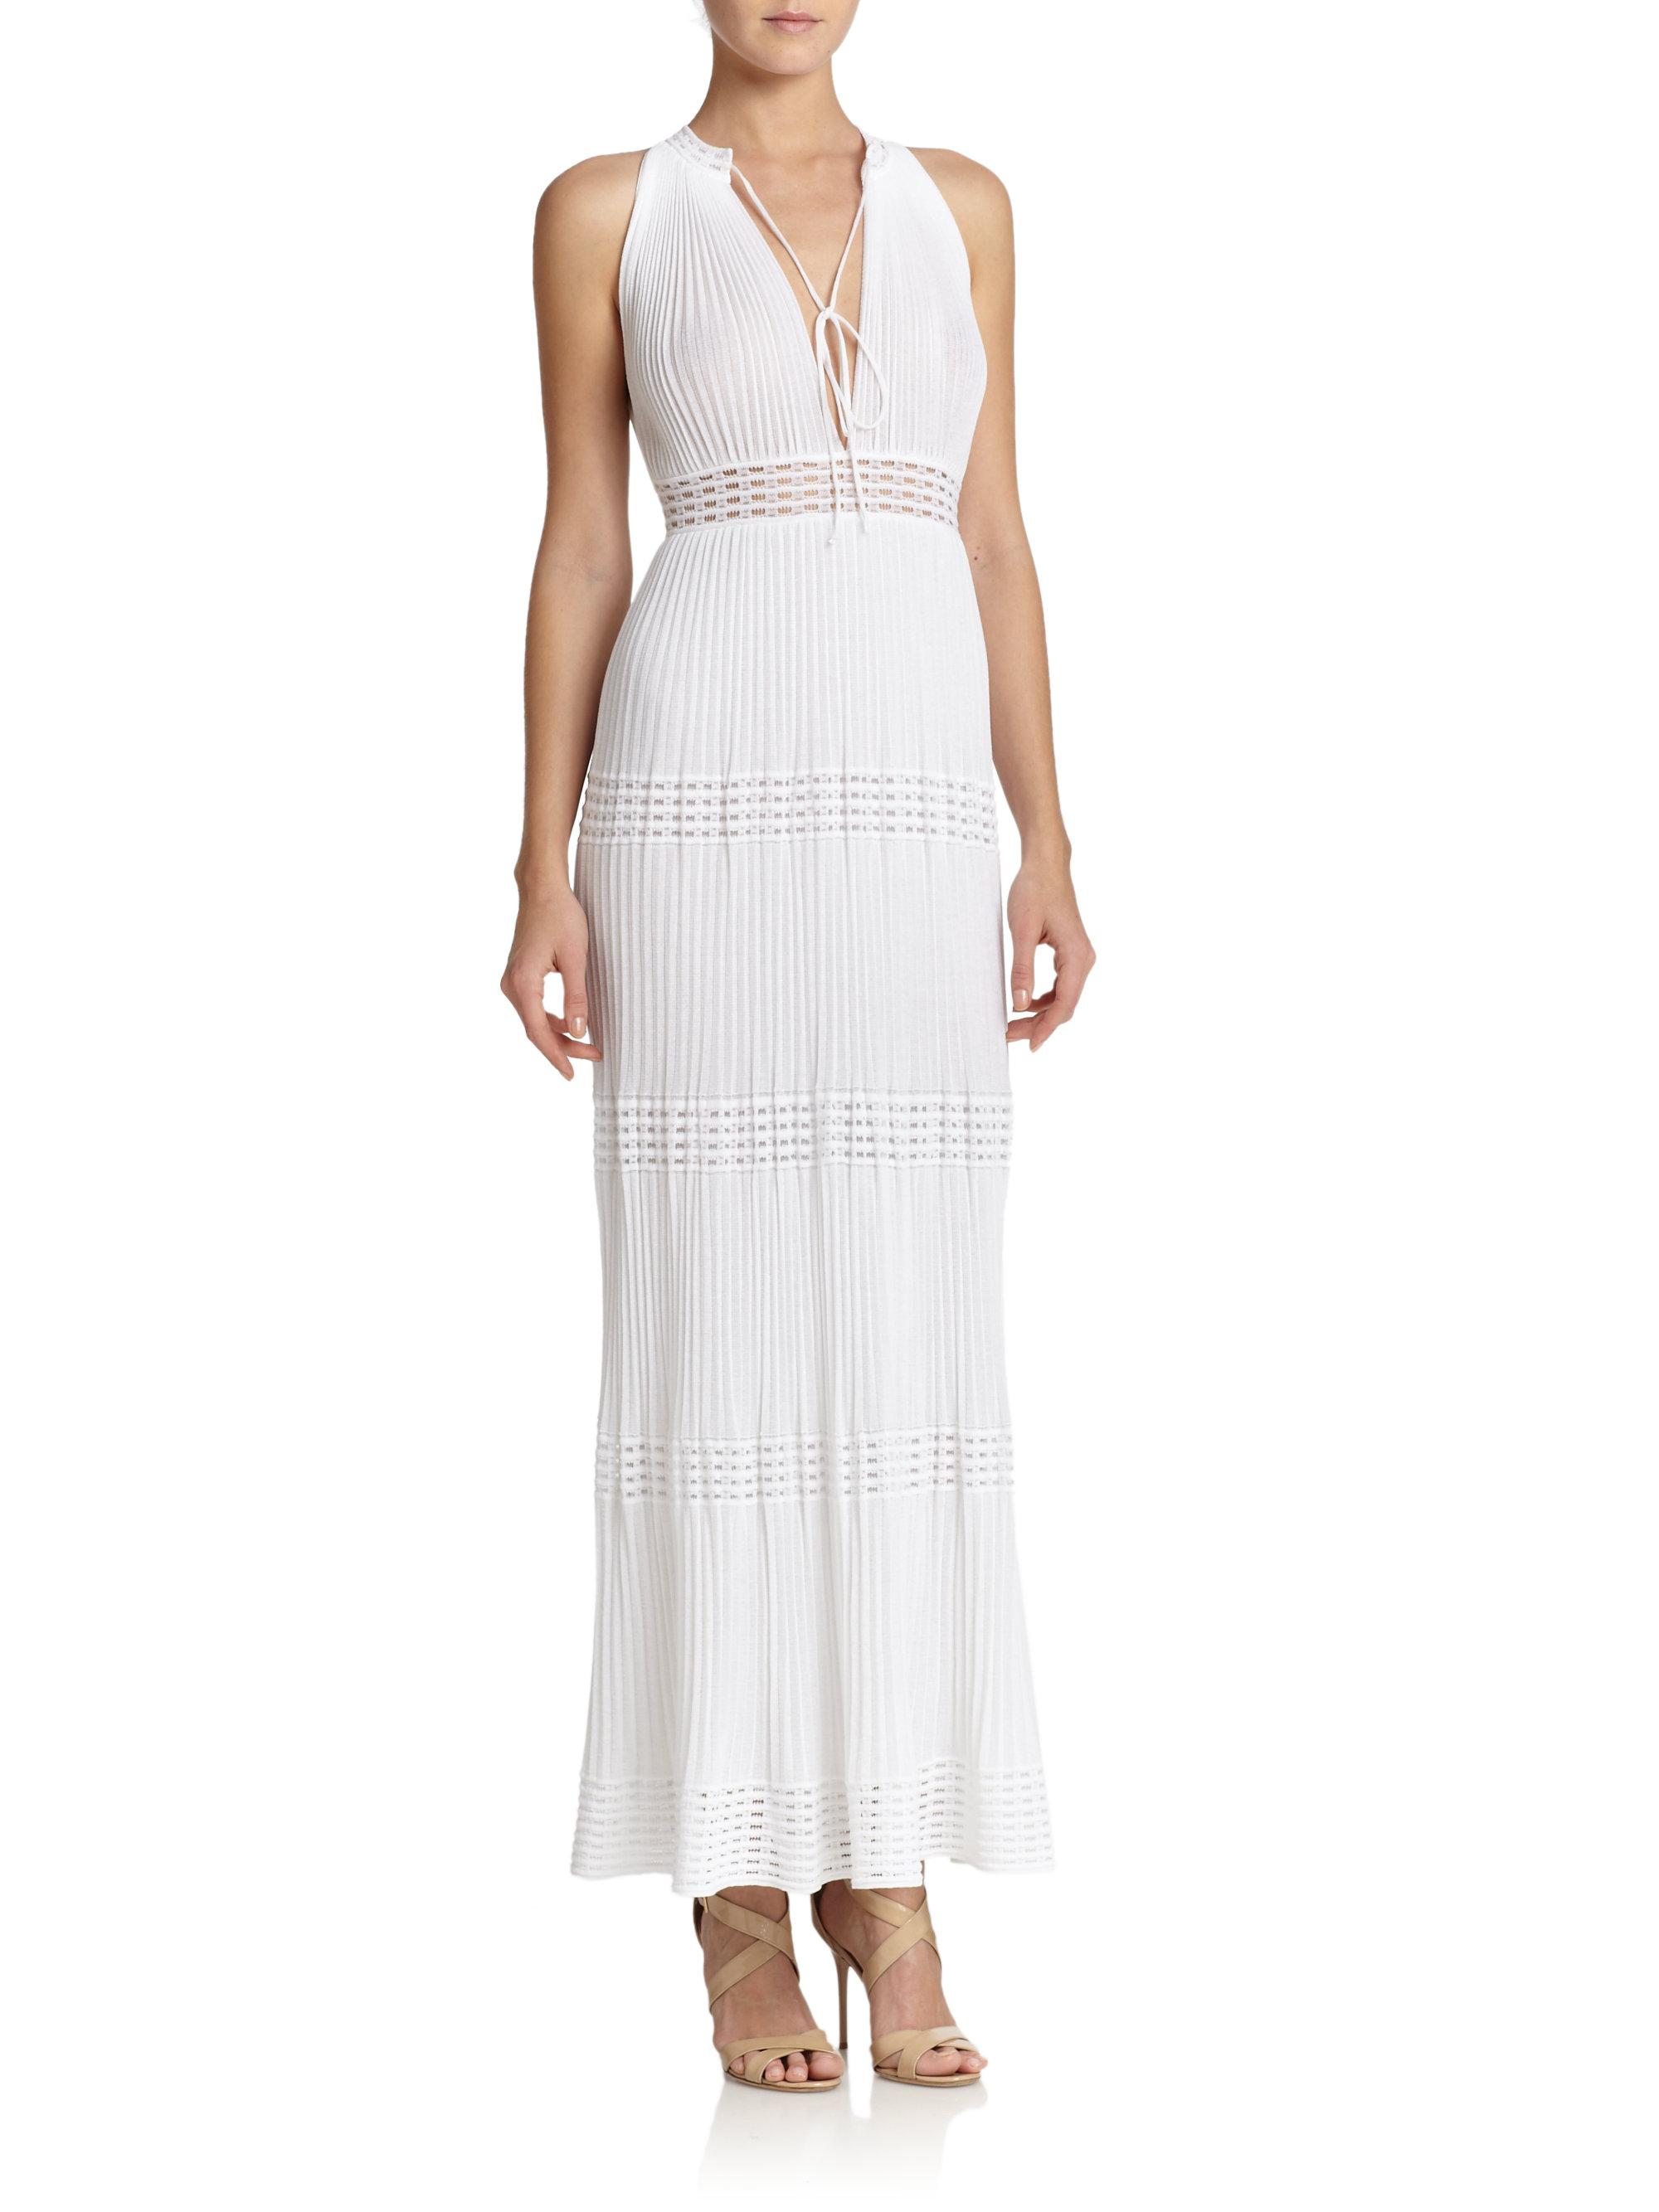 M missoni Grecian Maxi Dress in White  Lyst